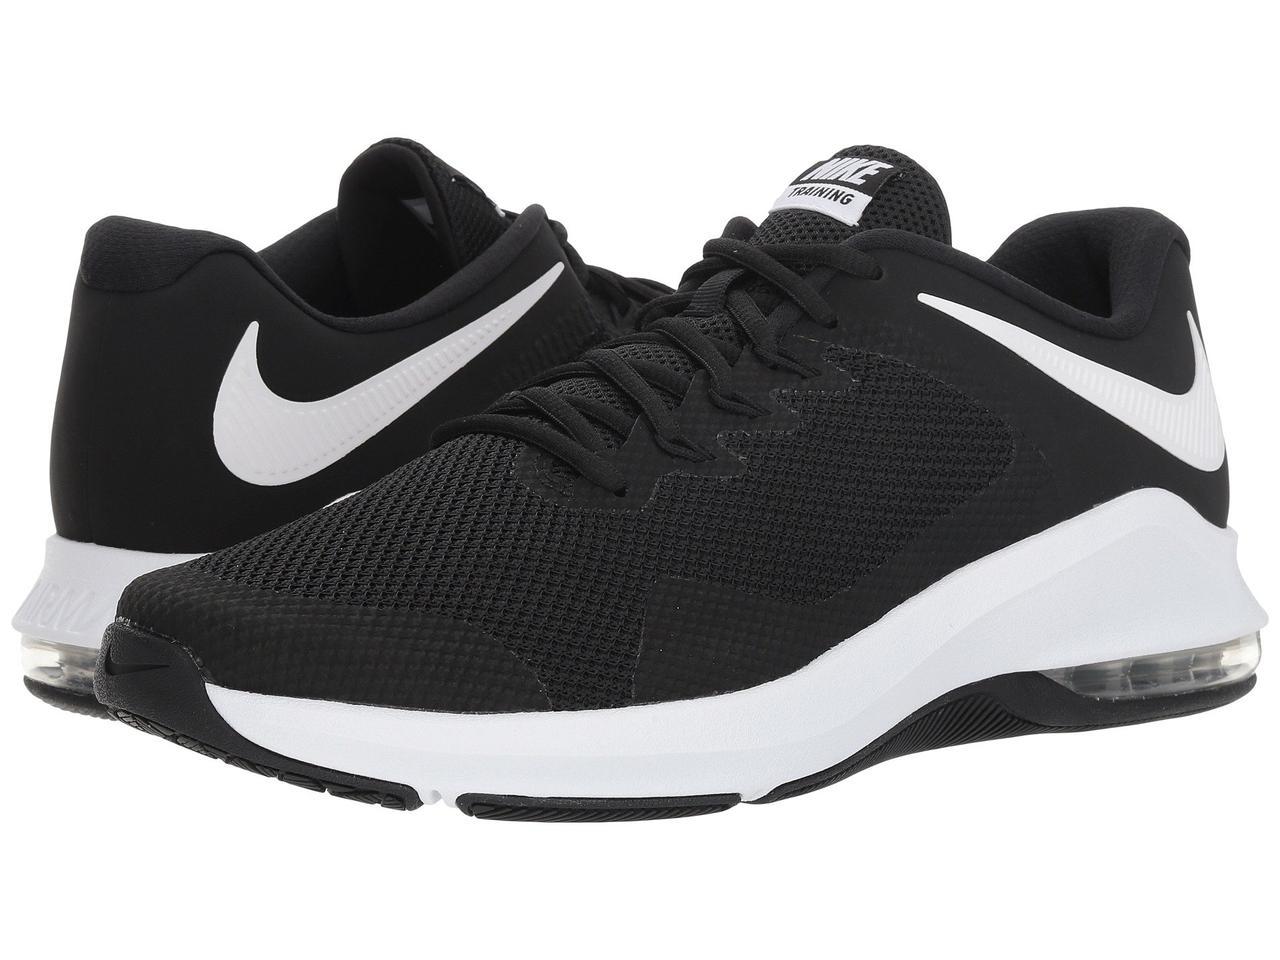 d584280417 Кроссовки/Кеды (Оригинал) Nike Air Max Alpha Trainer Black/White - TopUSA